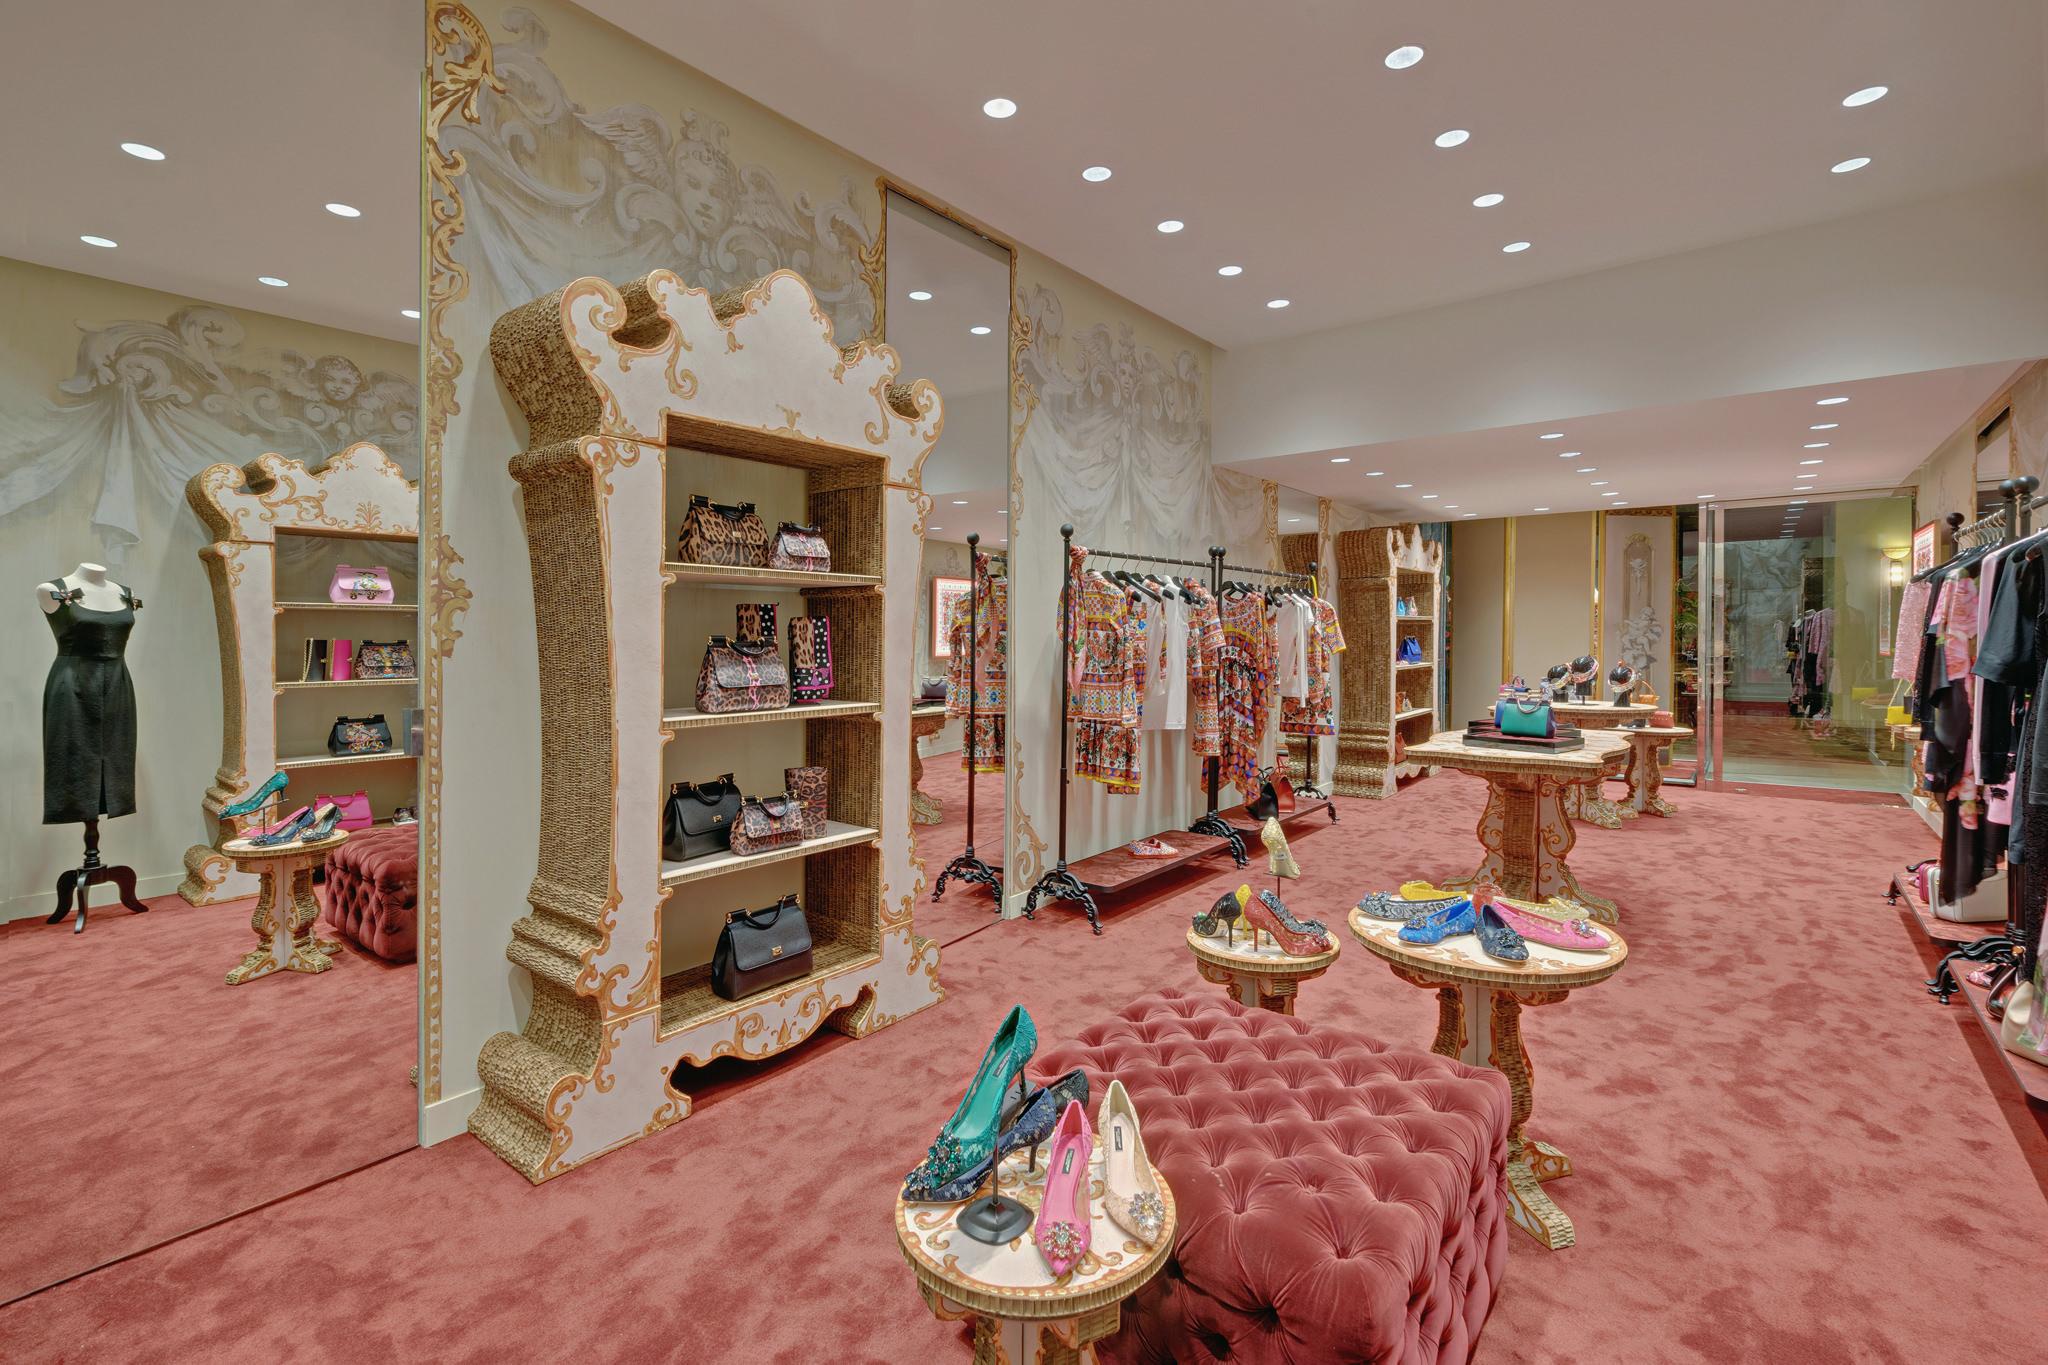 20170123 - Dolce & Gabbana - HCM - Commercial - Interior - Store - Retouch 0007.jpg